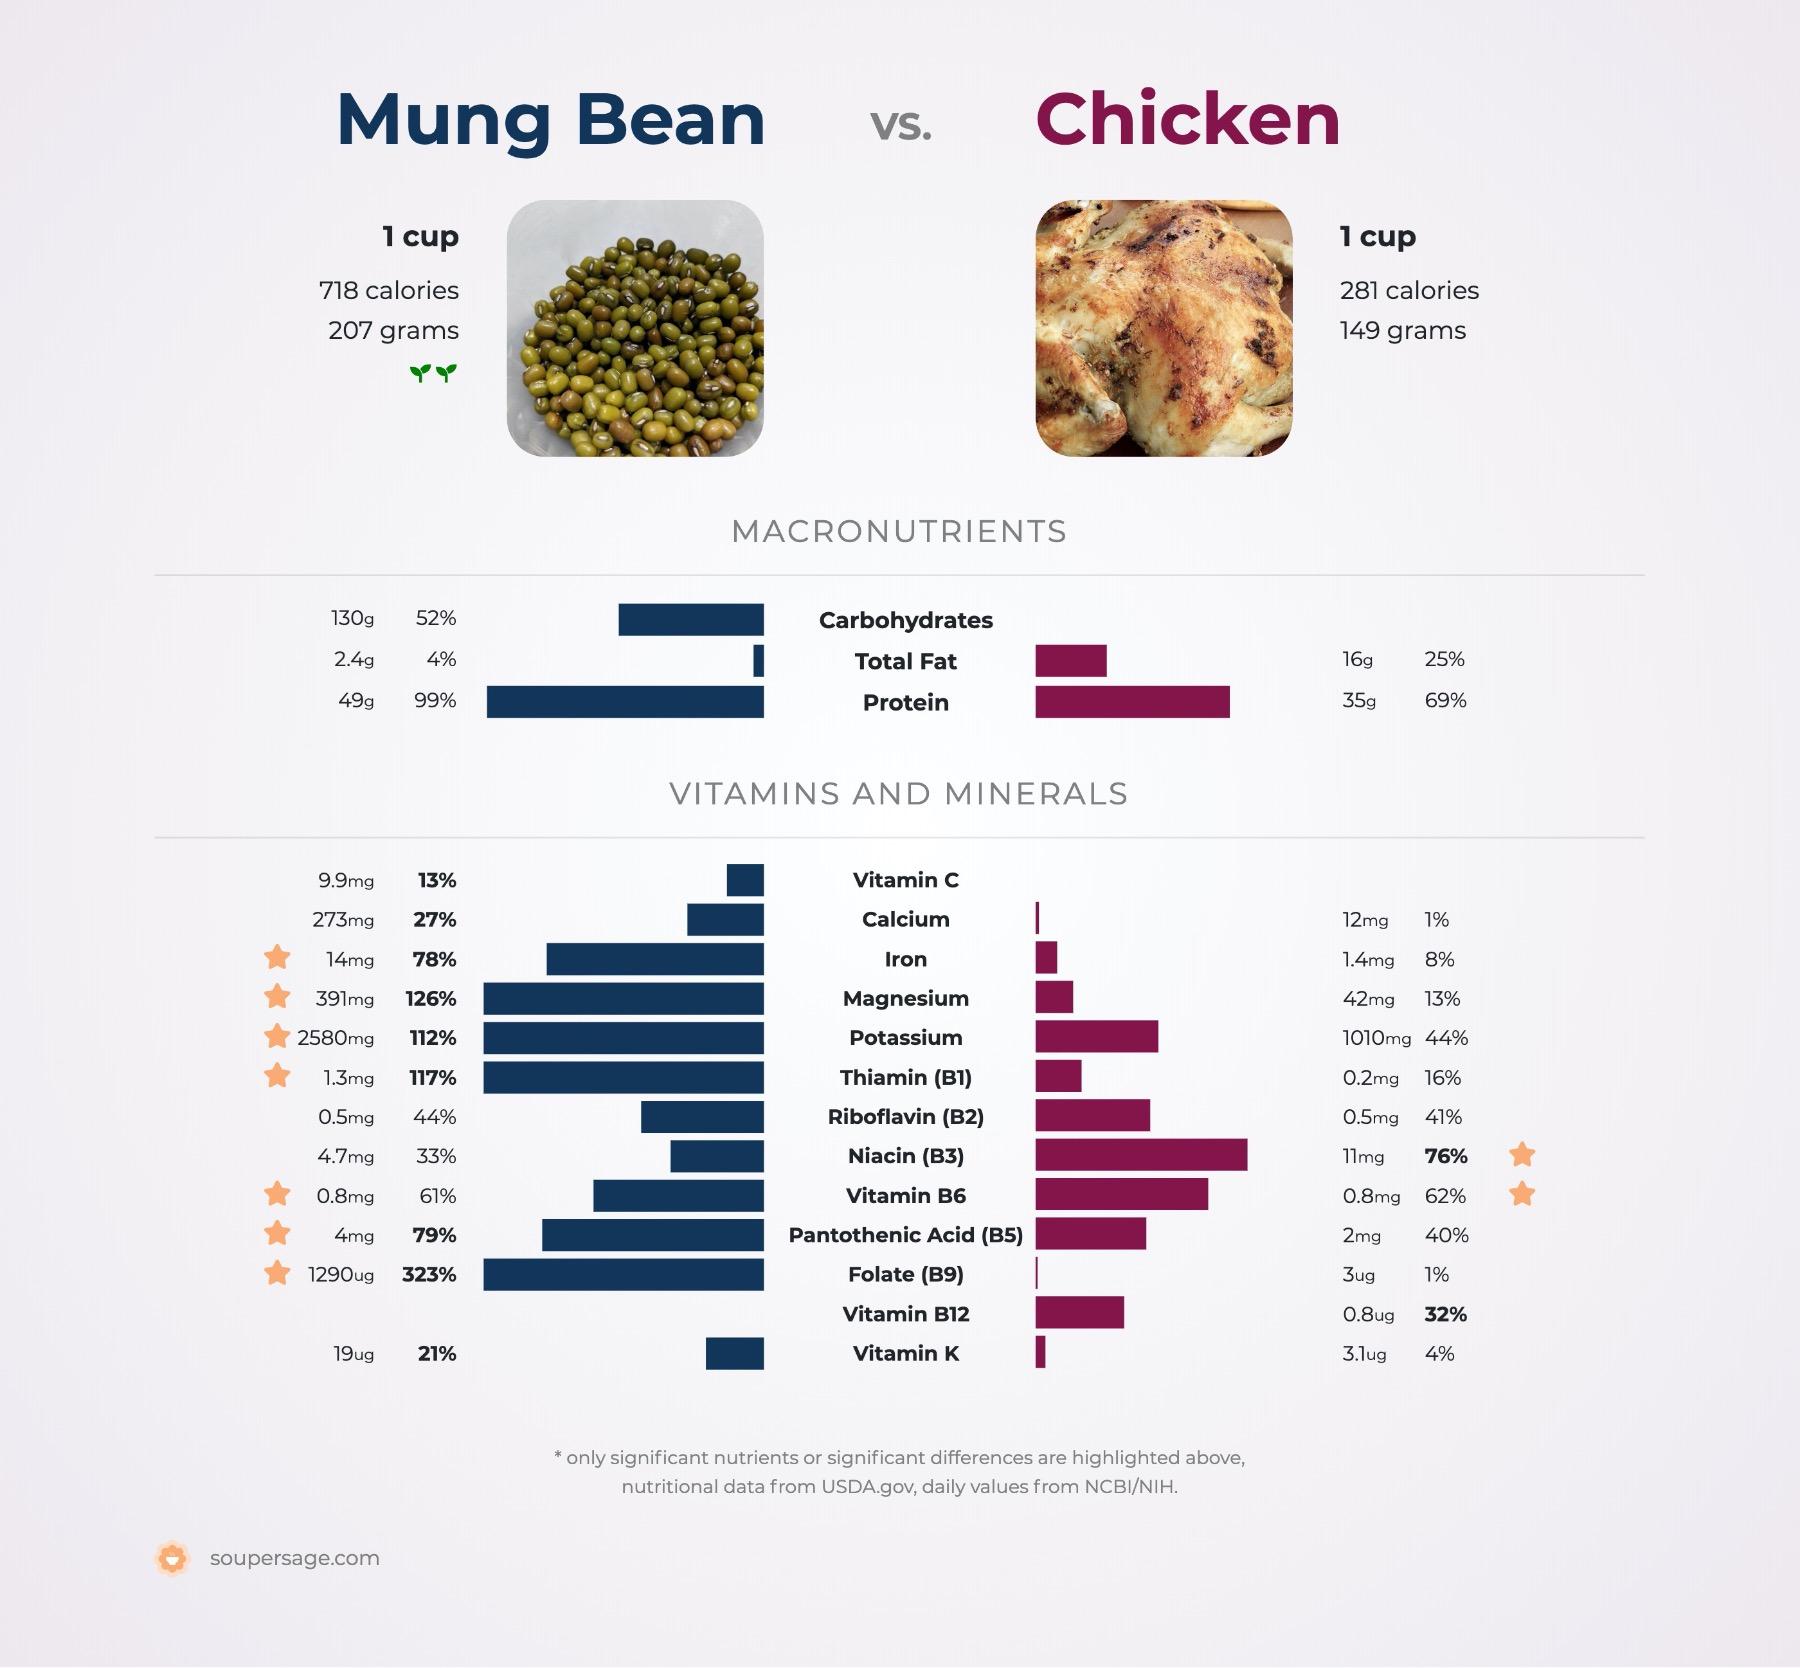 nutrition comparison of mung bean vs. chicken